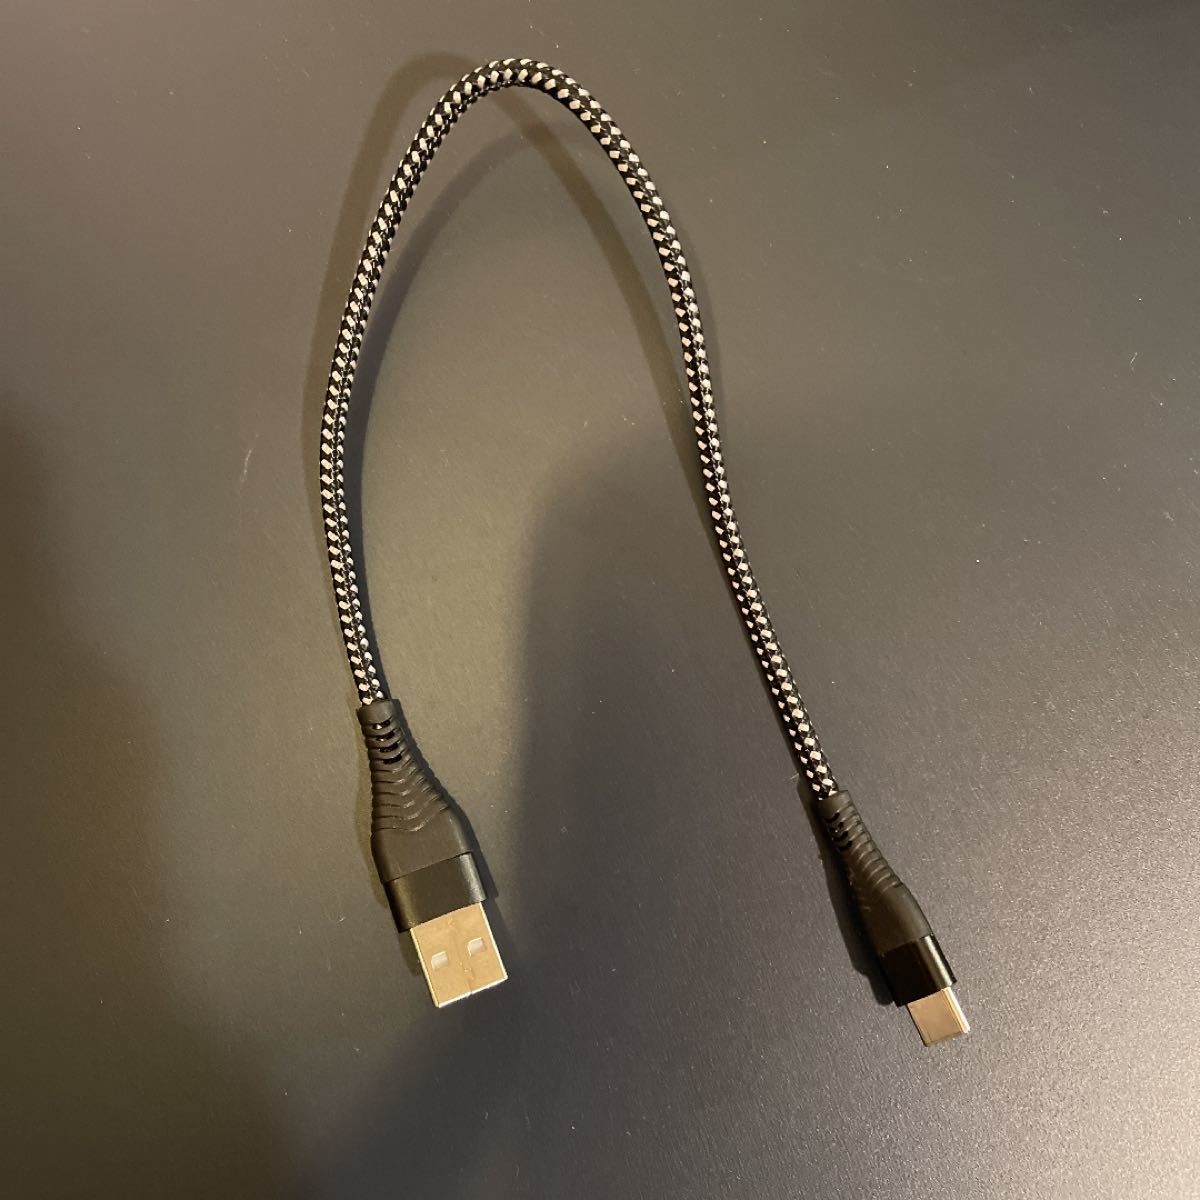 USB Type-Cケーブル 電源ケーブル